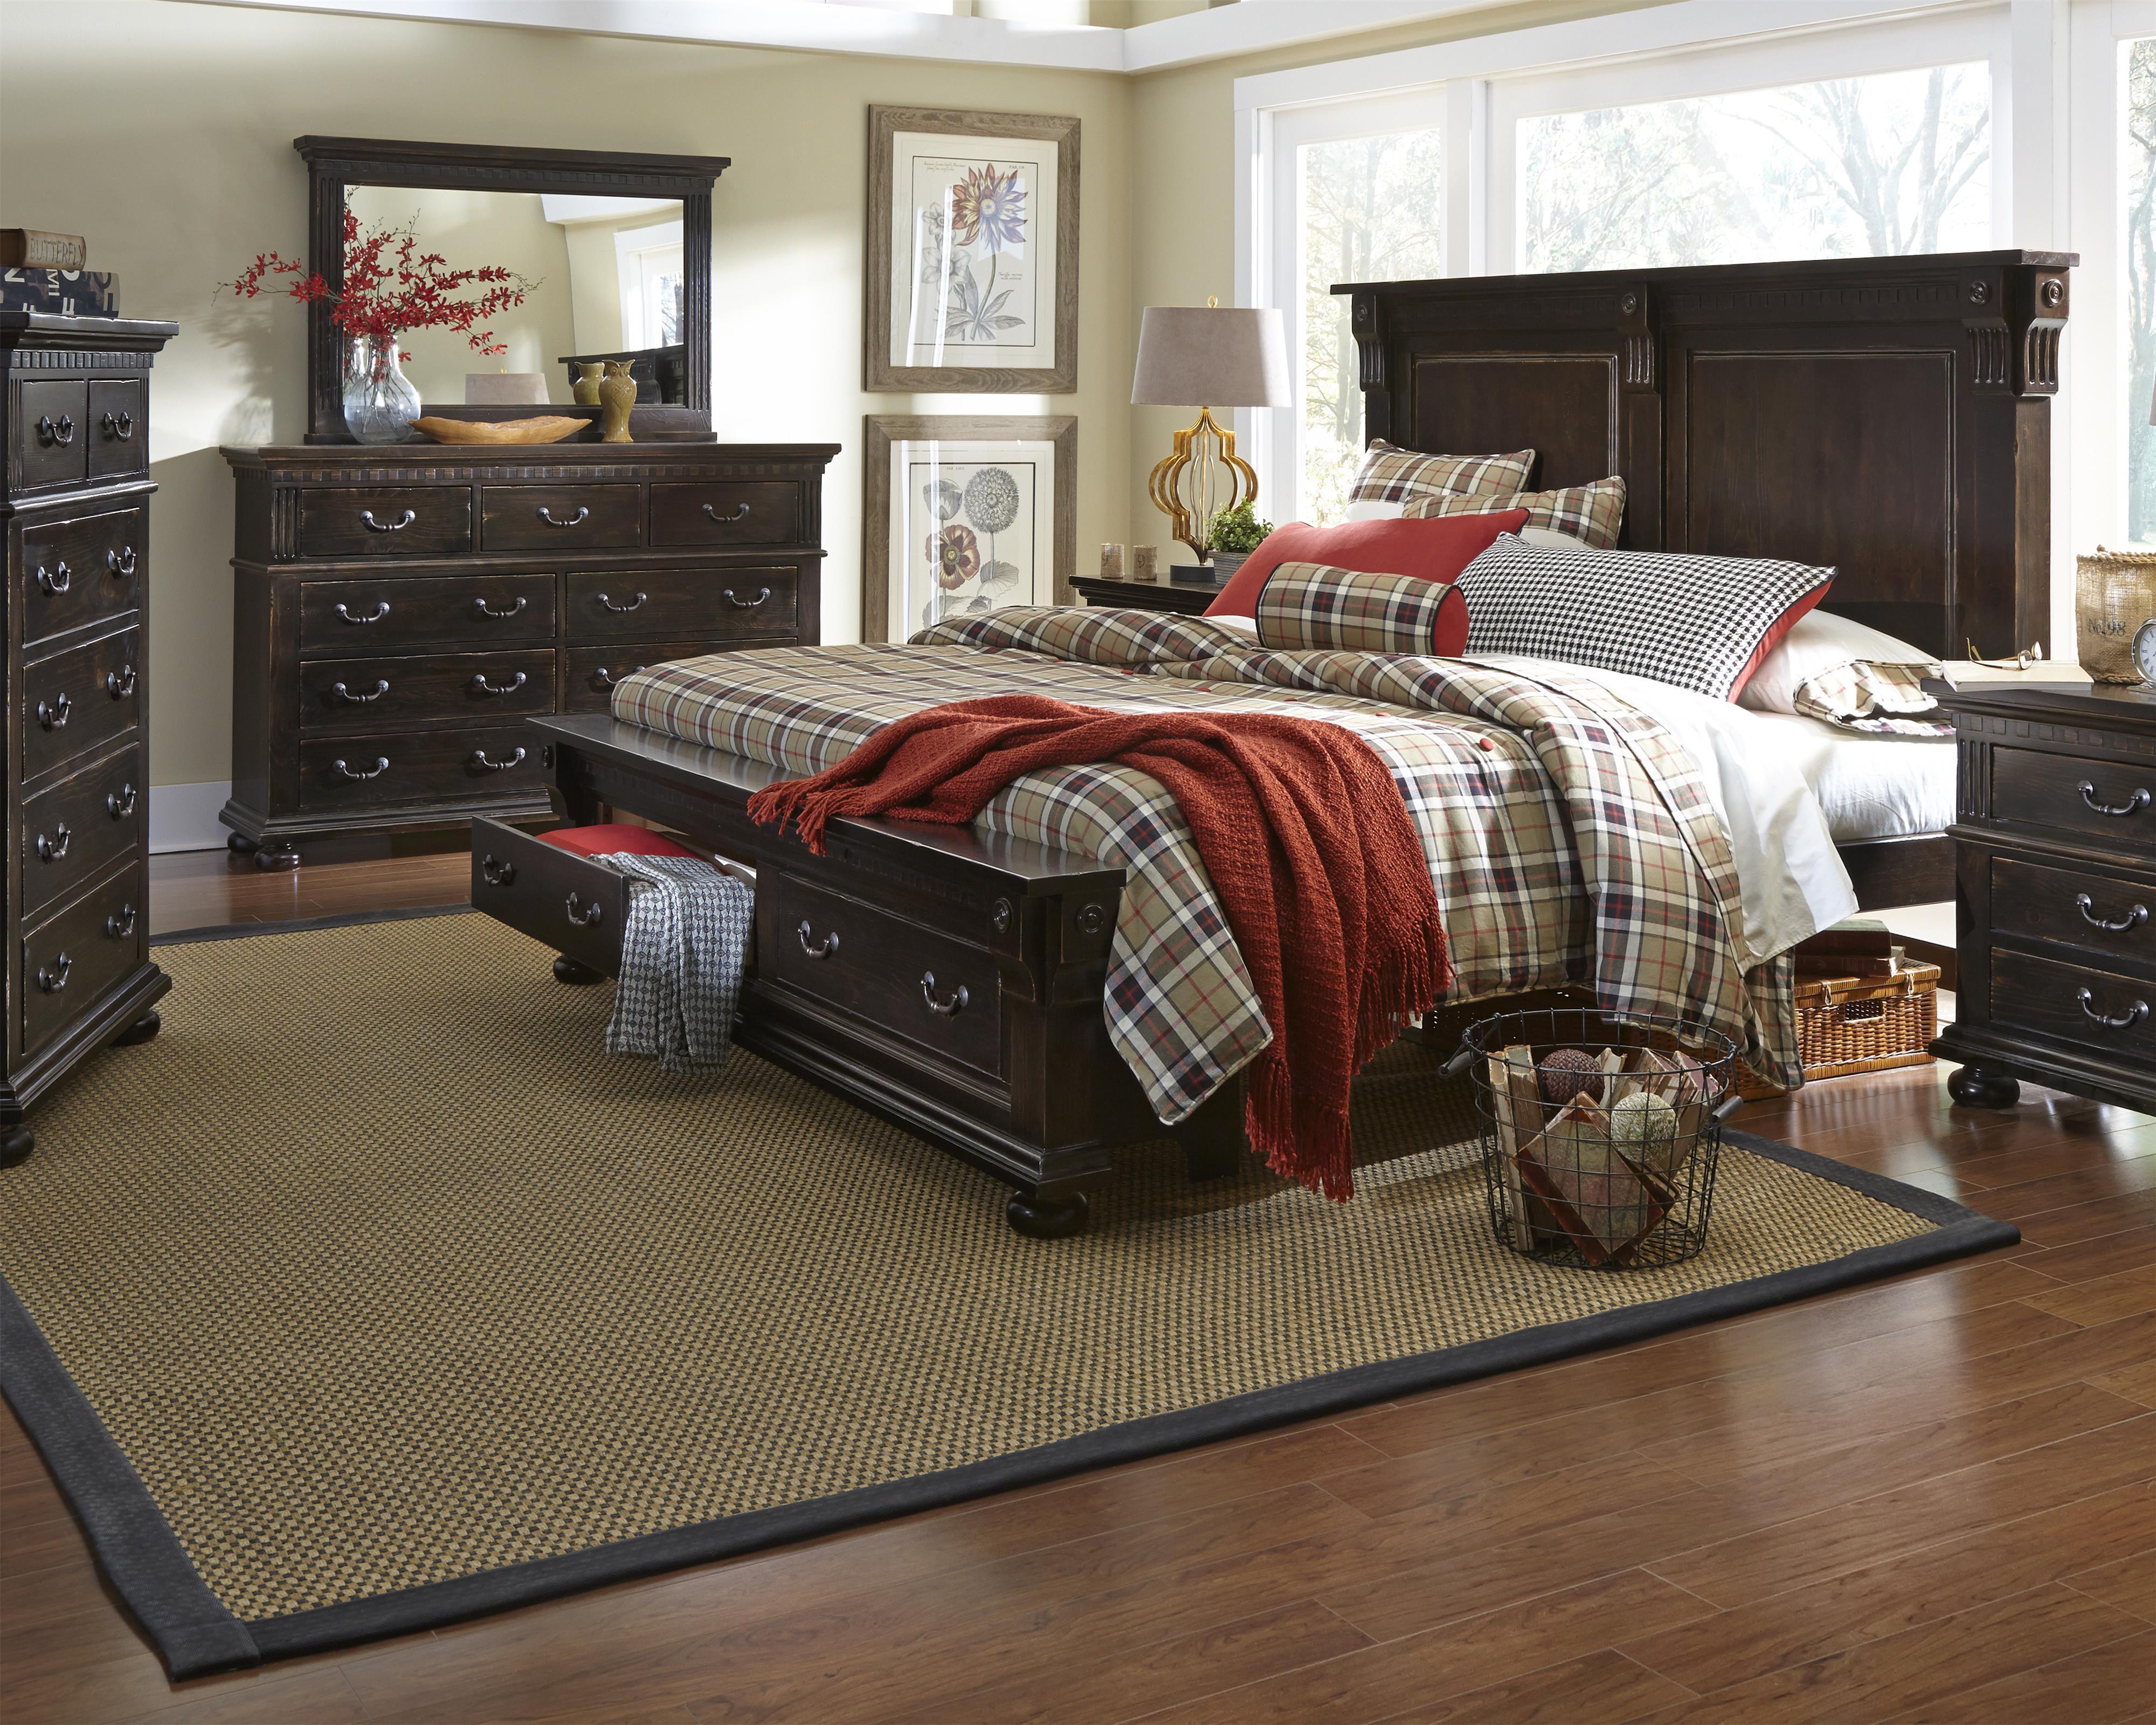 Furniture La Cantera Queen Bedroom Group Item Number P665 Q Bedroom